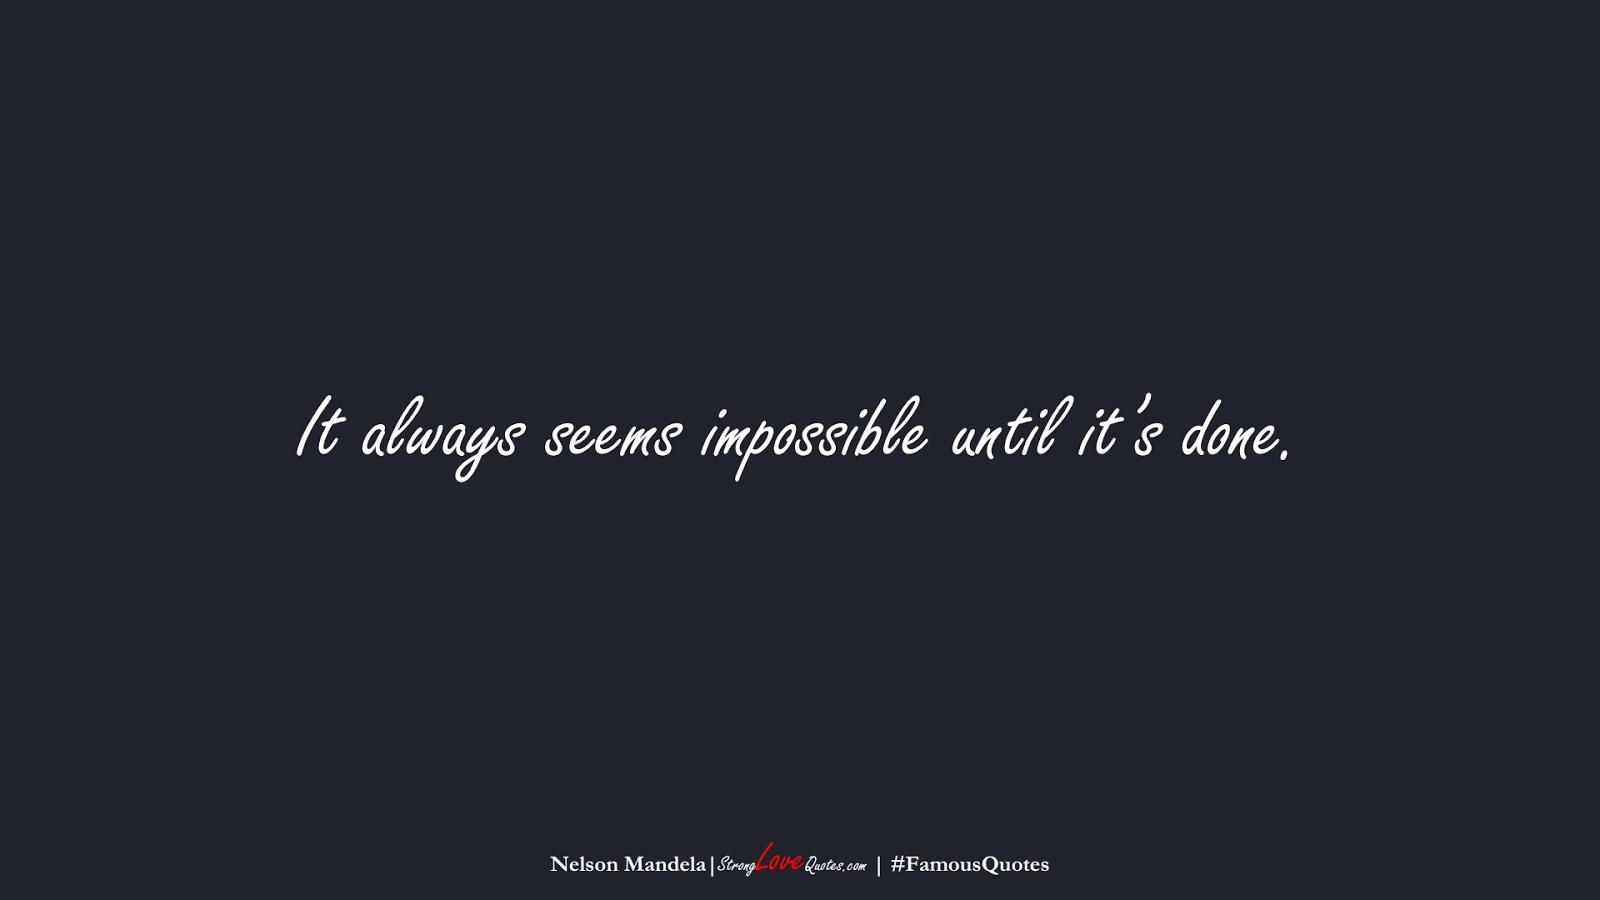 It always seems impossible until it's done. (Nelson Mandela);  #FamousQuotes